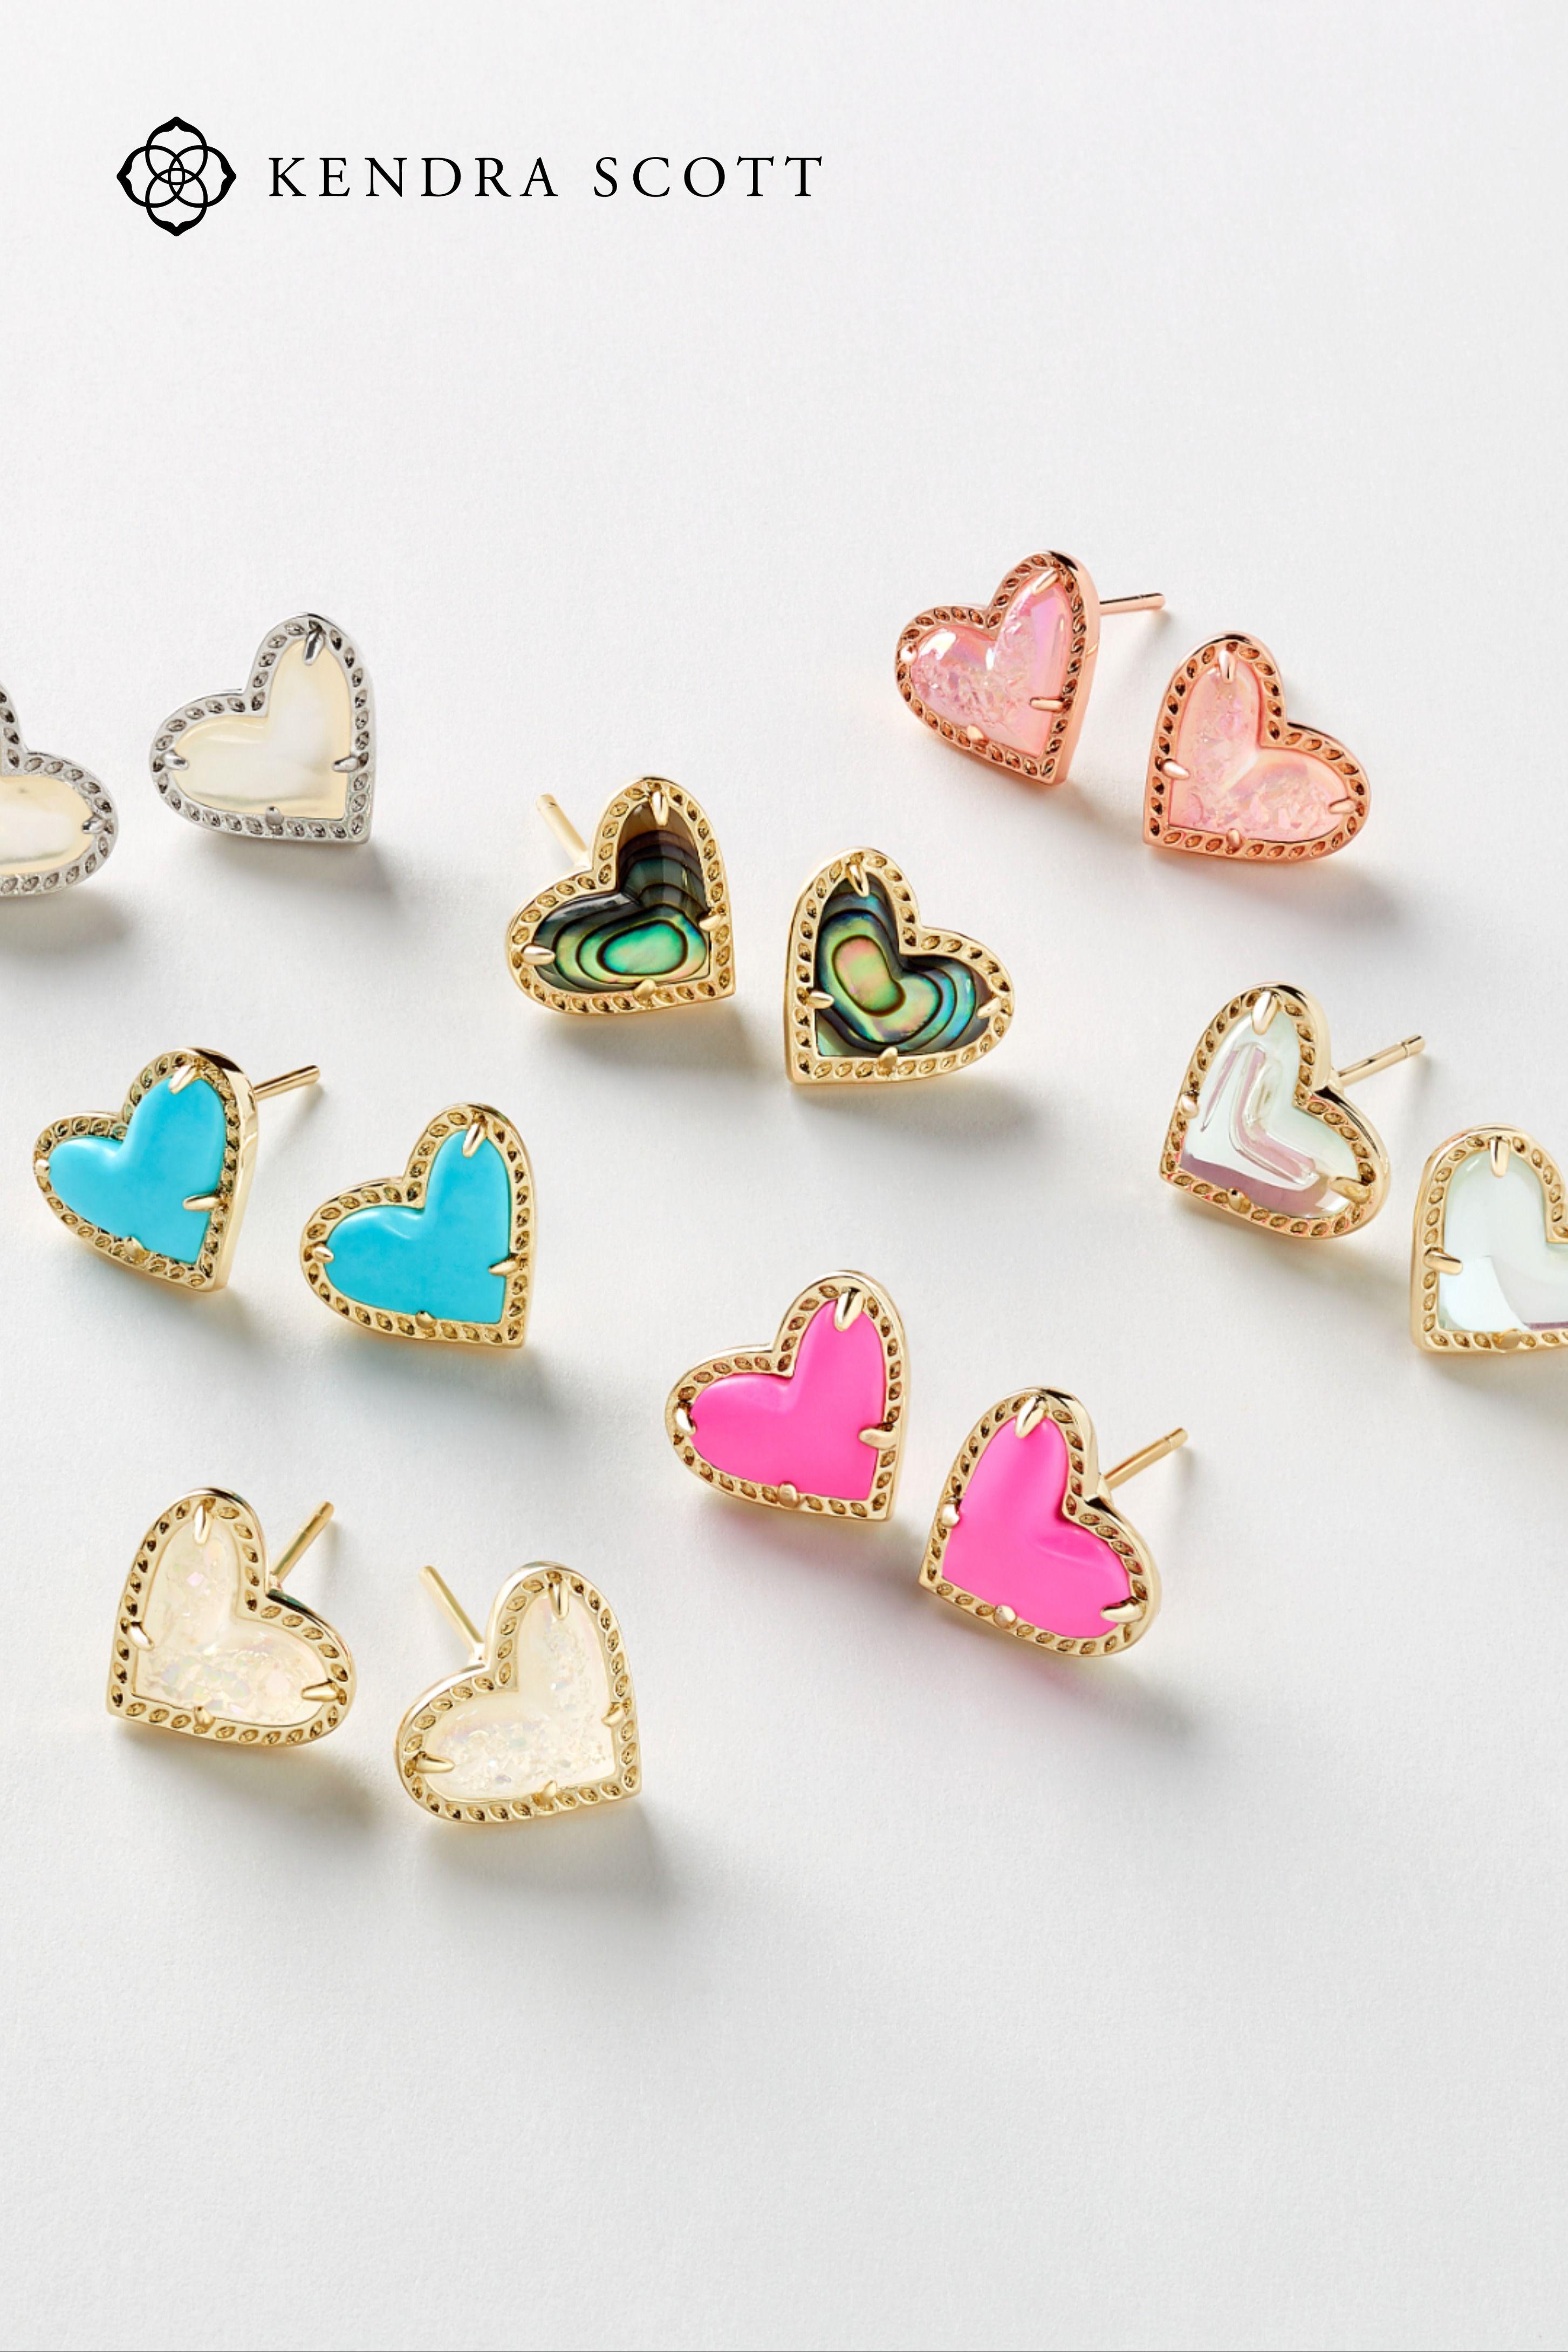 26+ Where to find kendra scott jewelry ideas